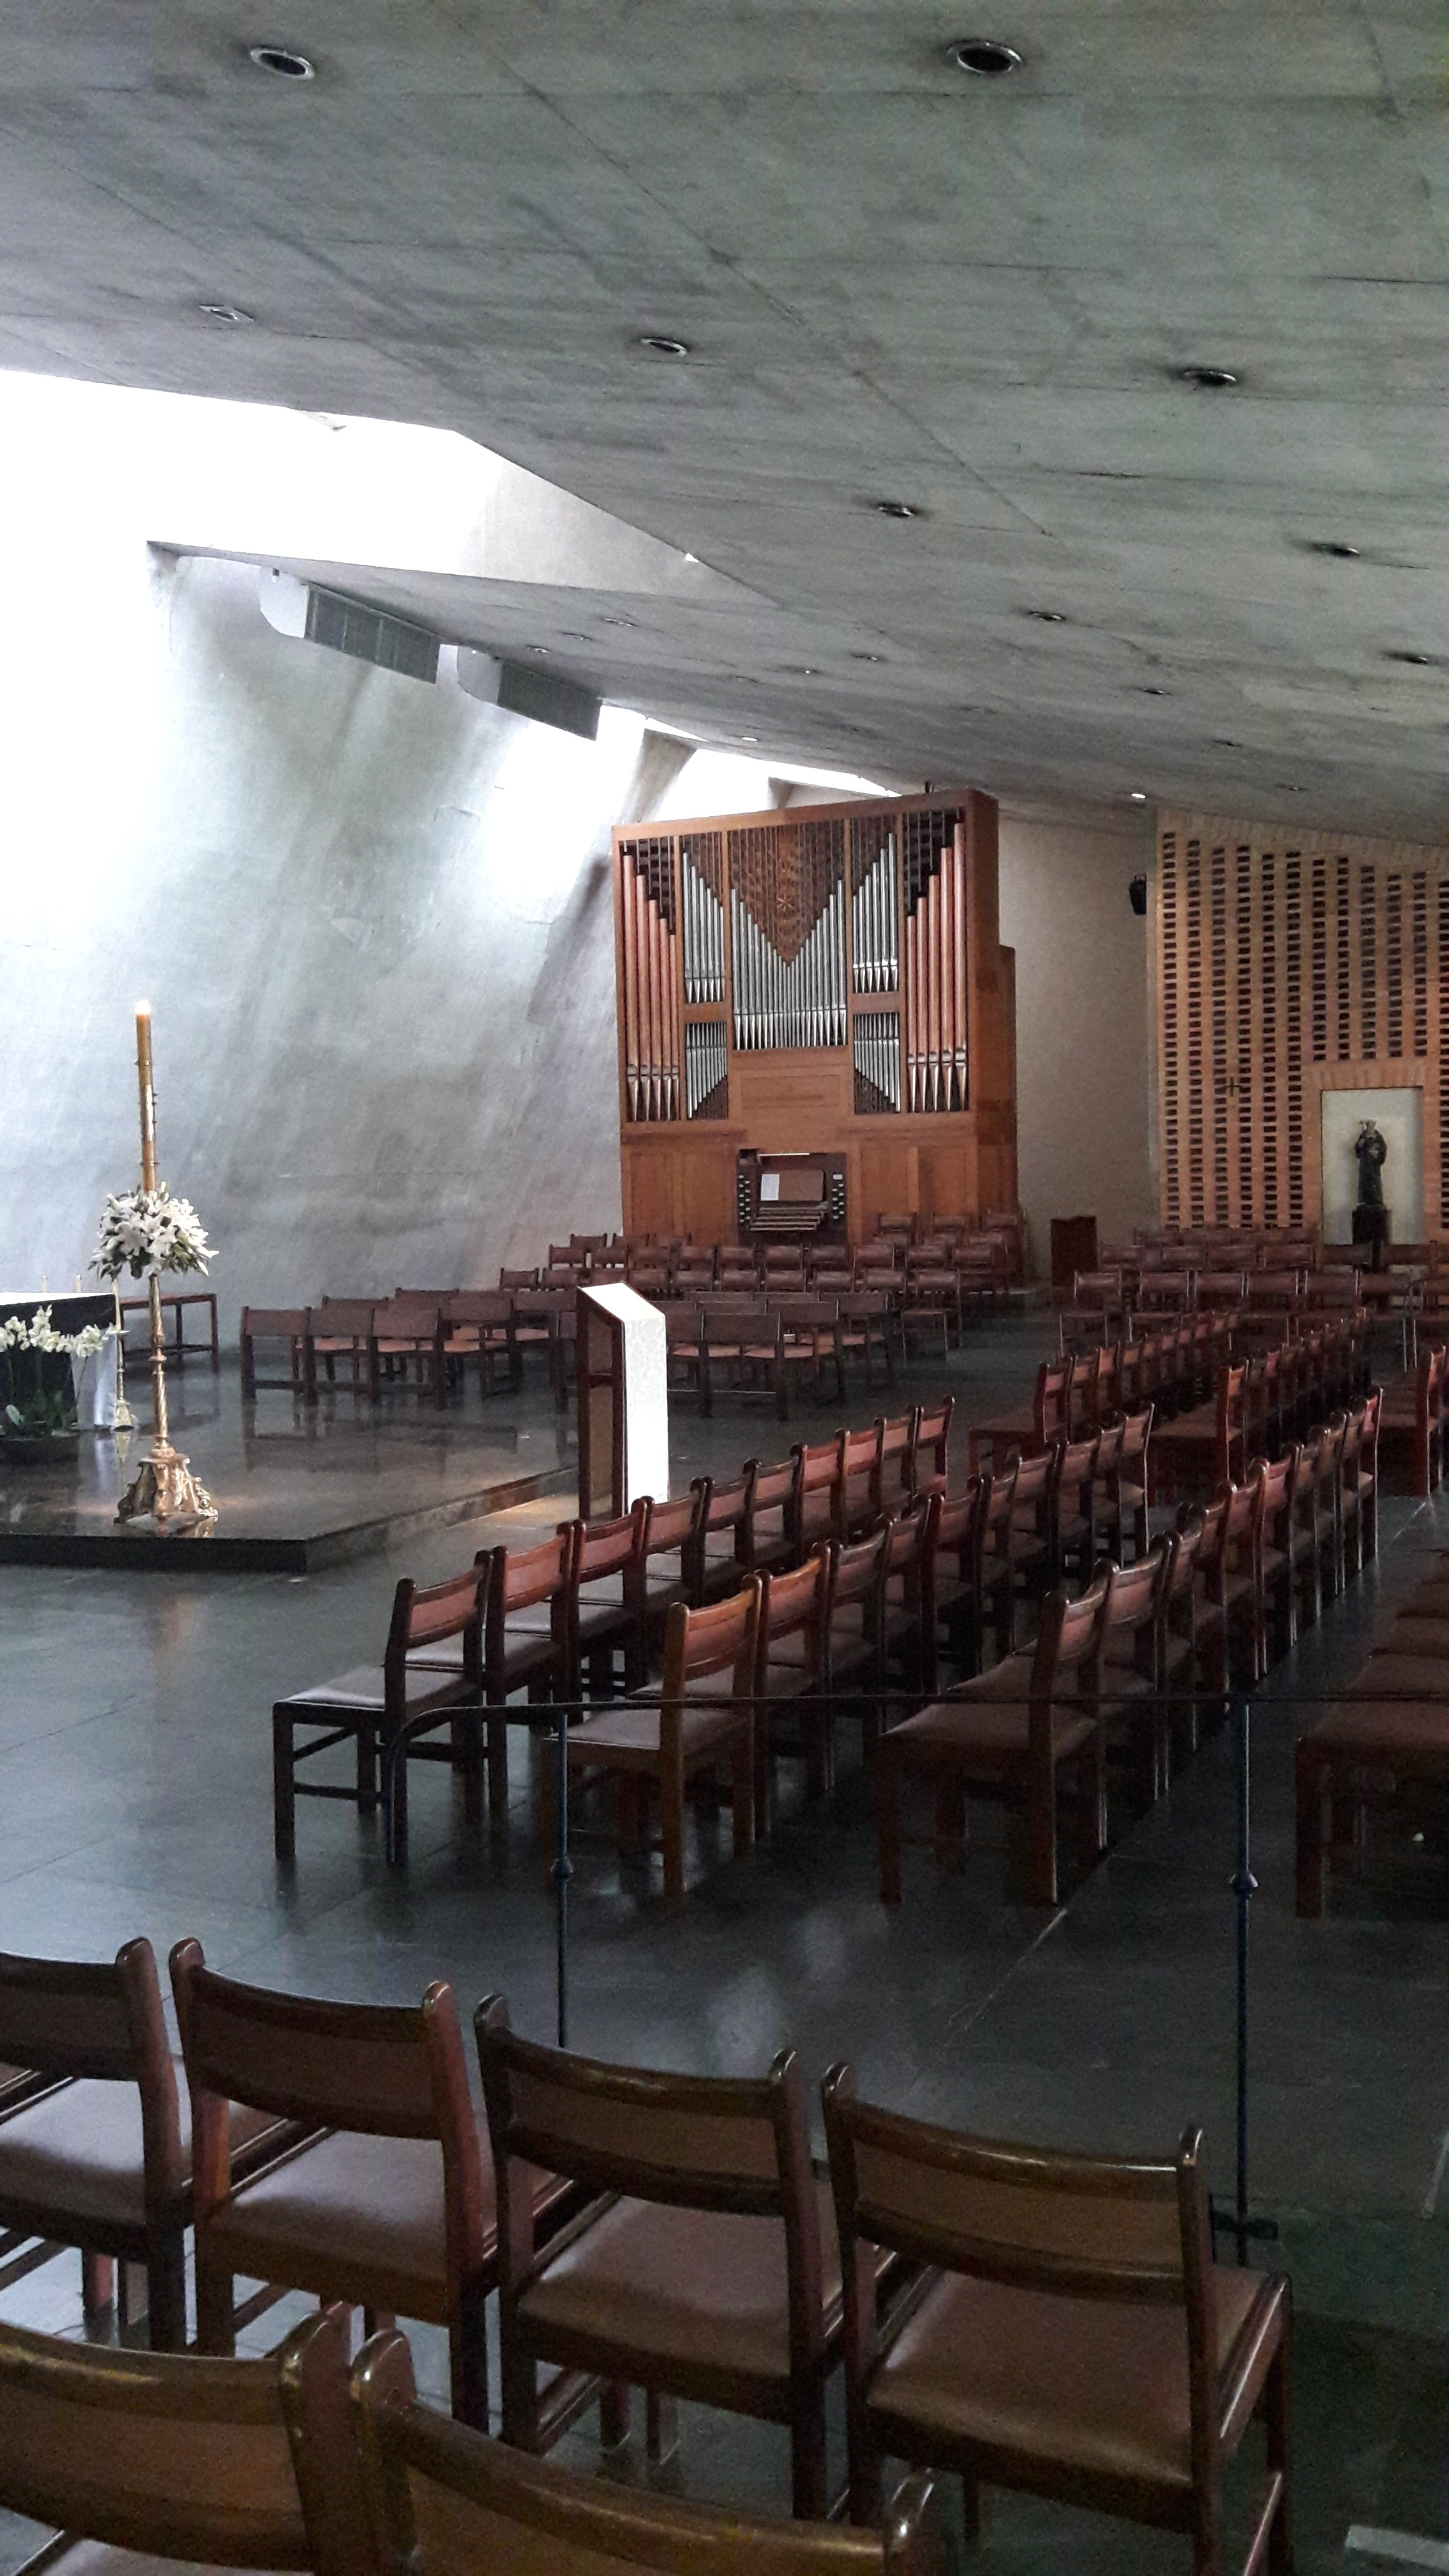 vinhedo-sp-mon-sao-bento-main-altar-may17